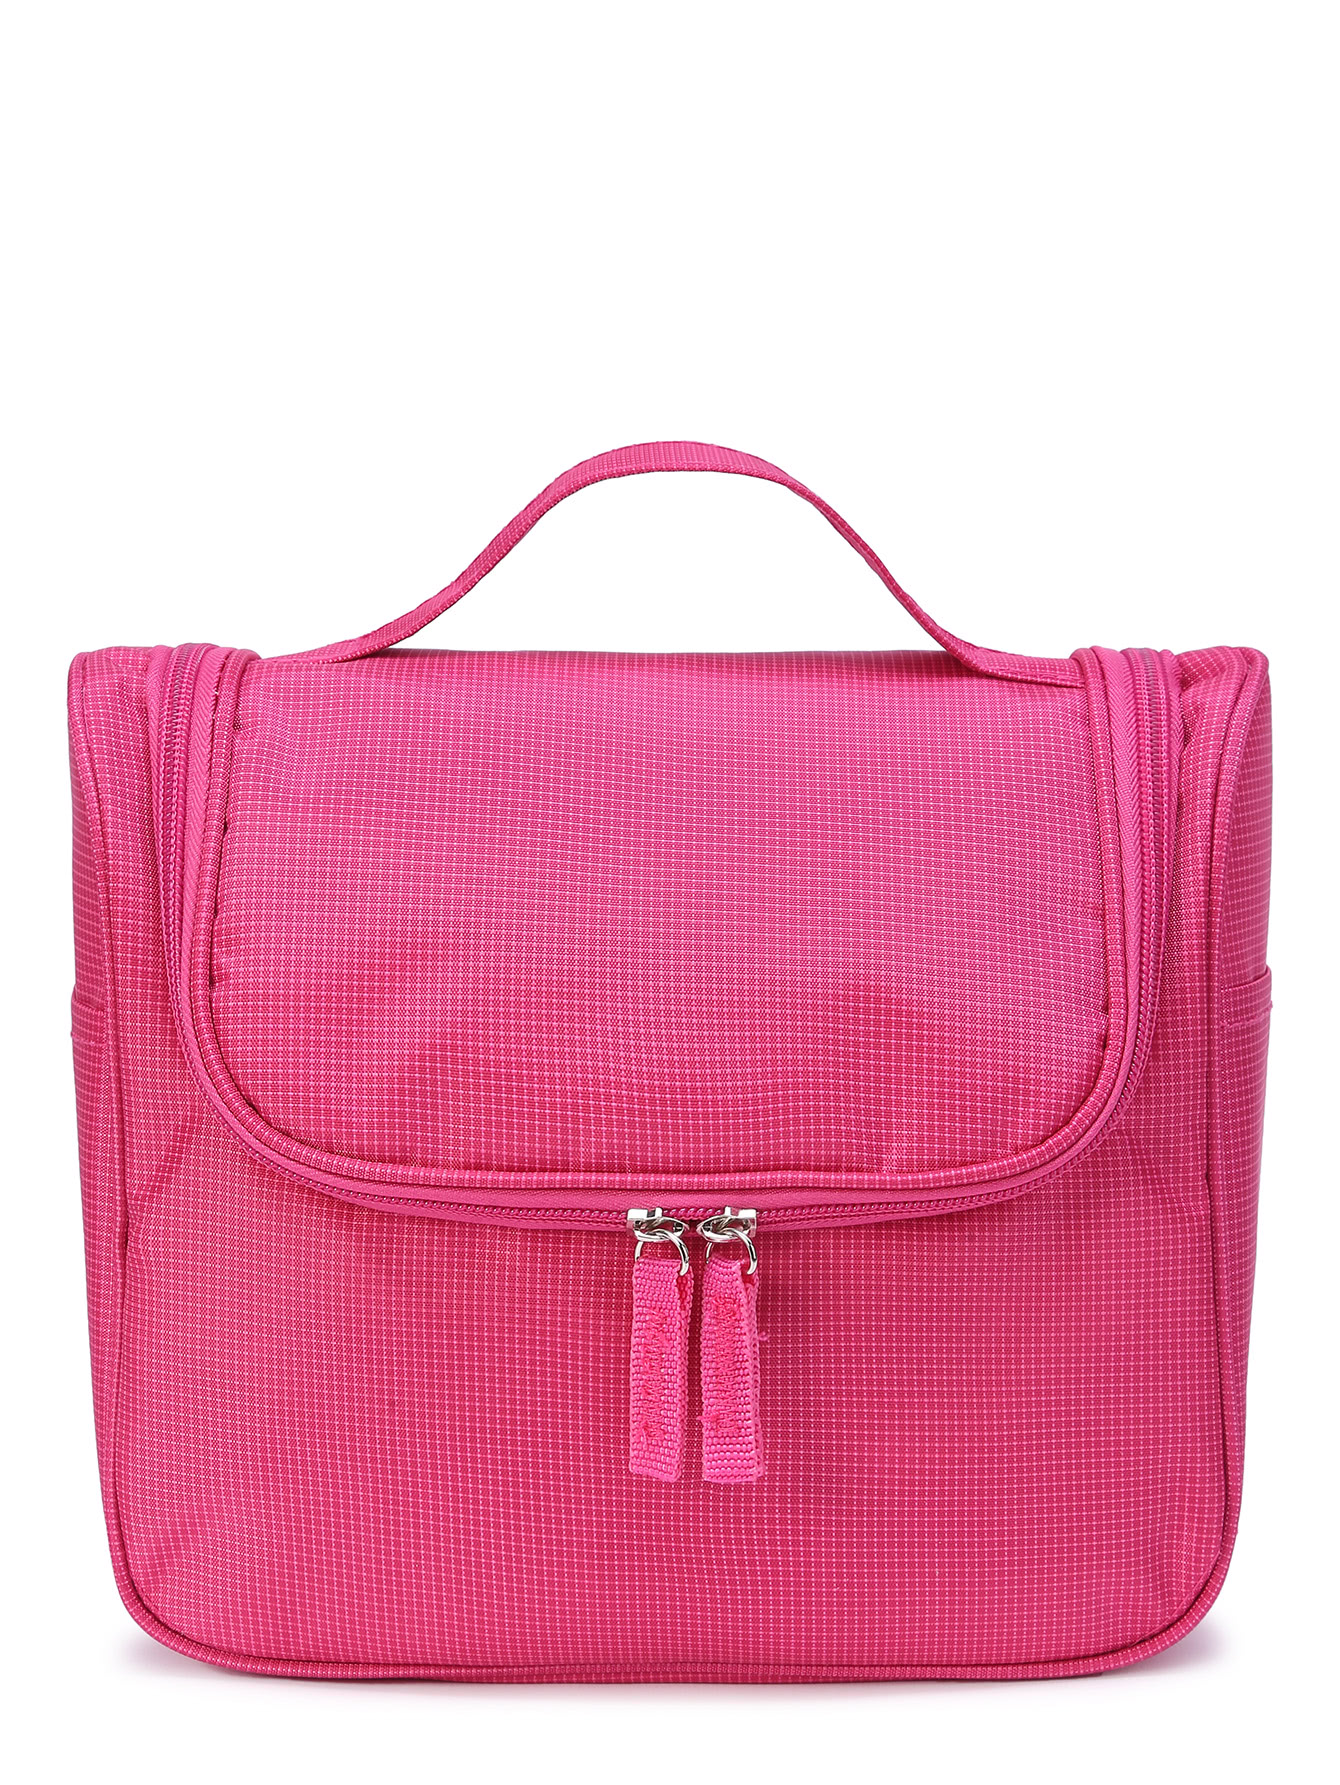 Double Zipper Nylon Make Up Bag